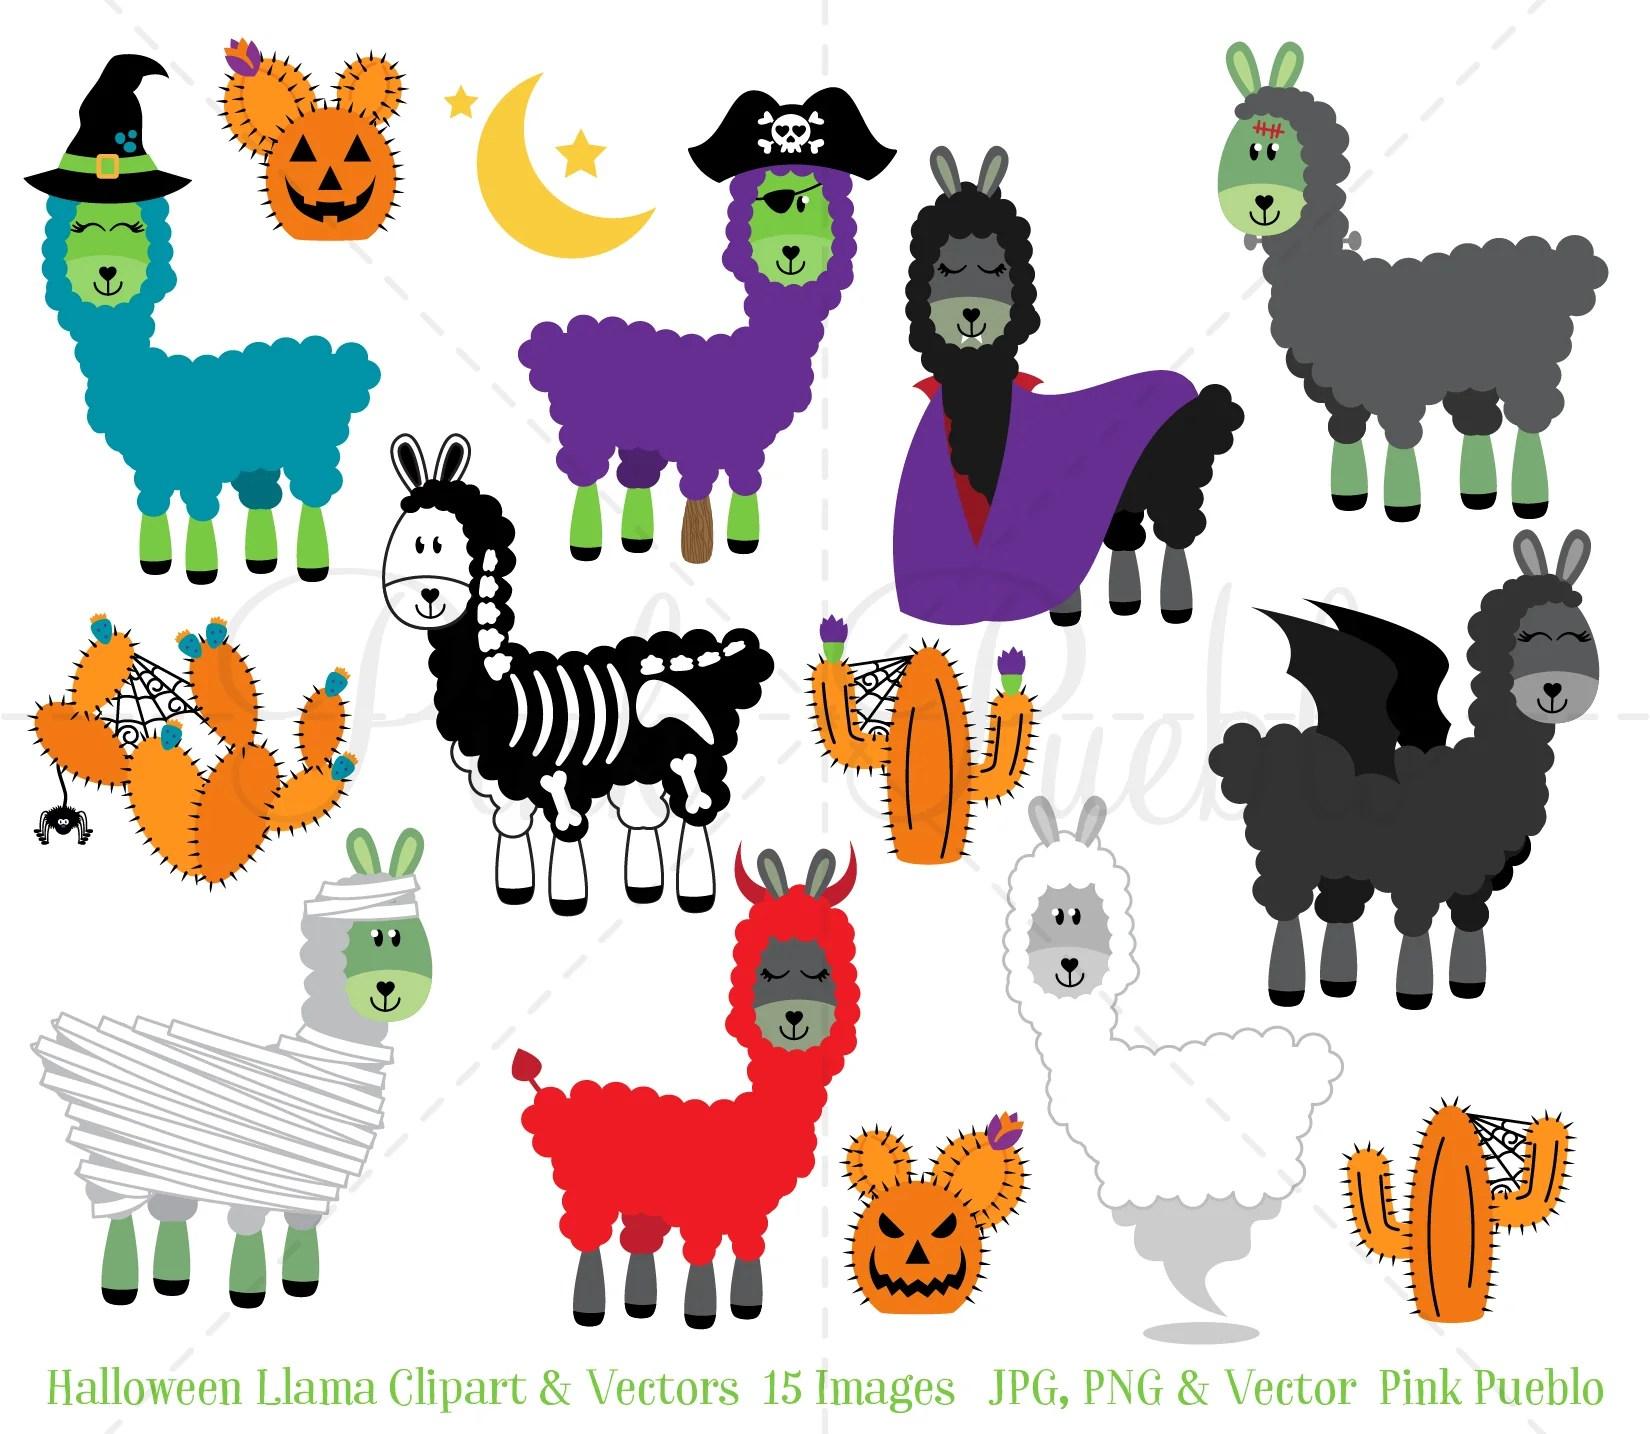 small resolution of halloween llama clipart and vectors